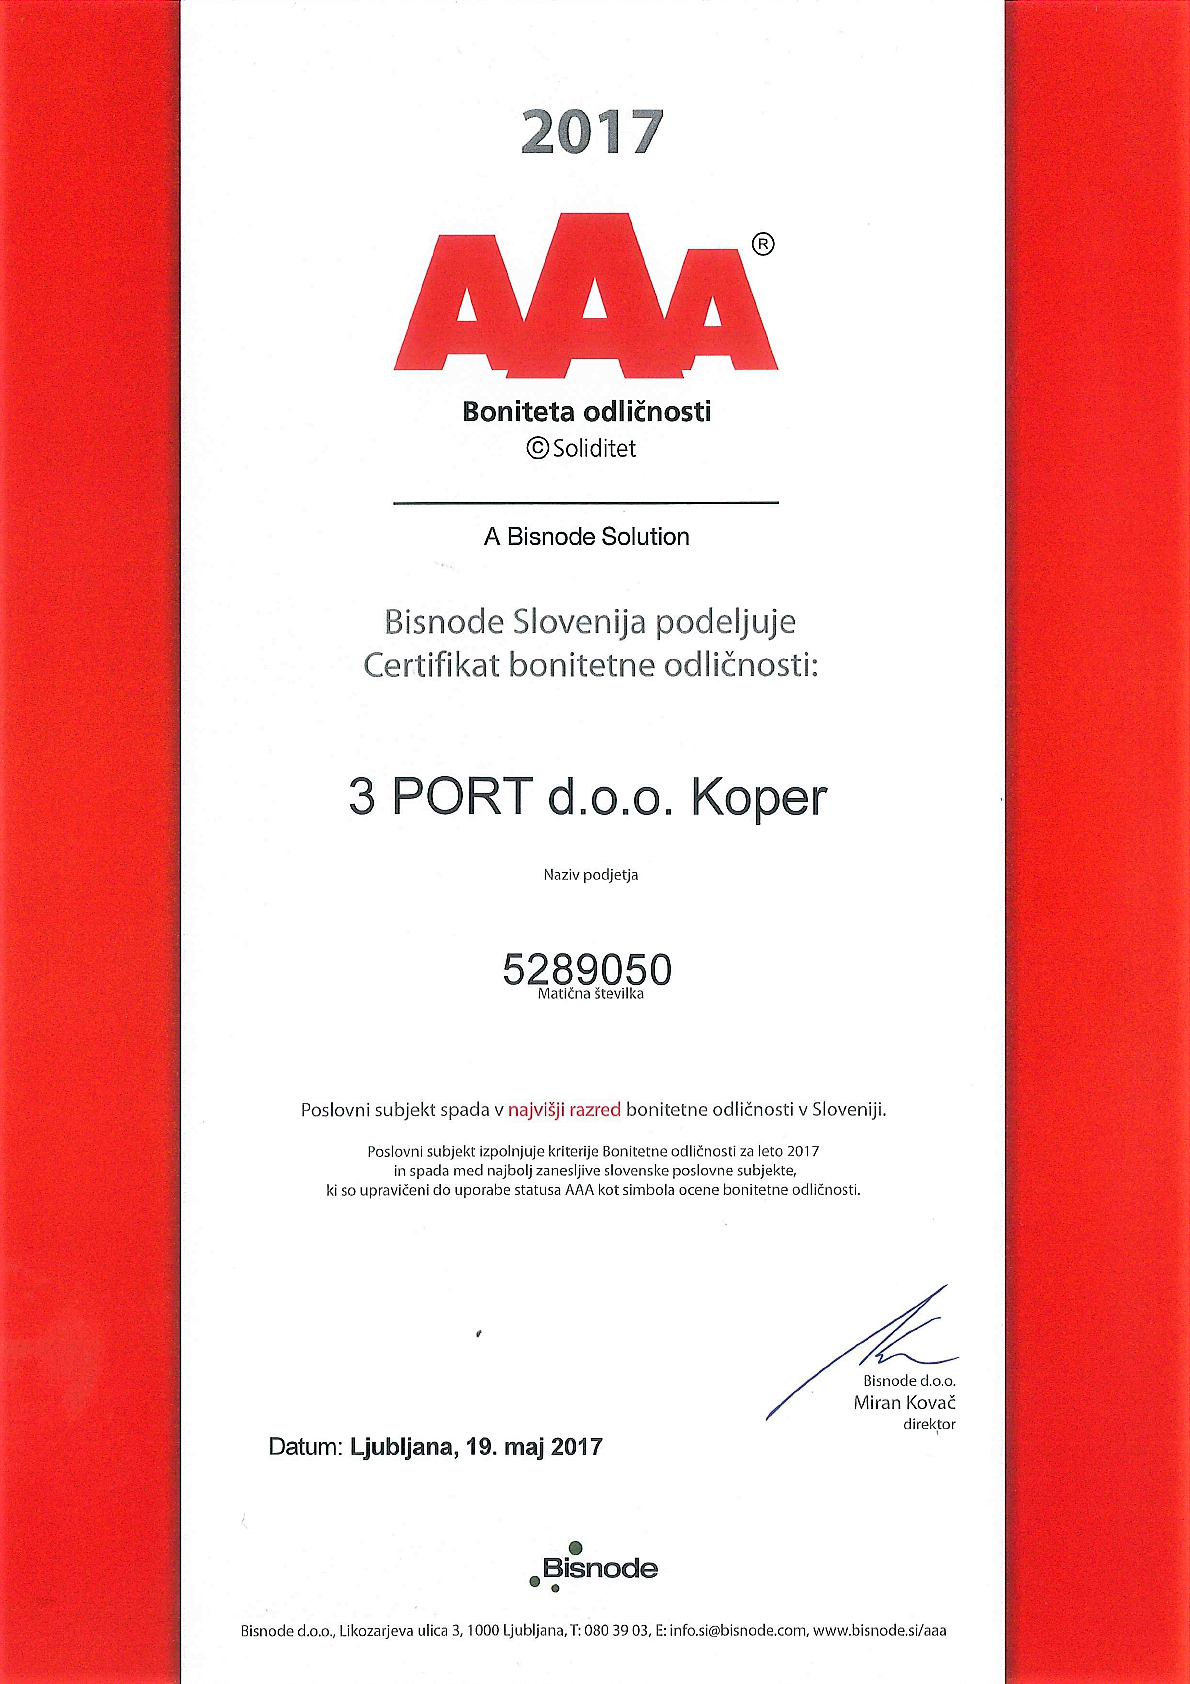 2017 Bisnode AAA certifikat bonitetne odličnosti SLO